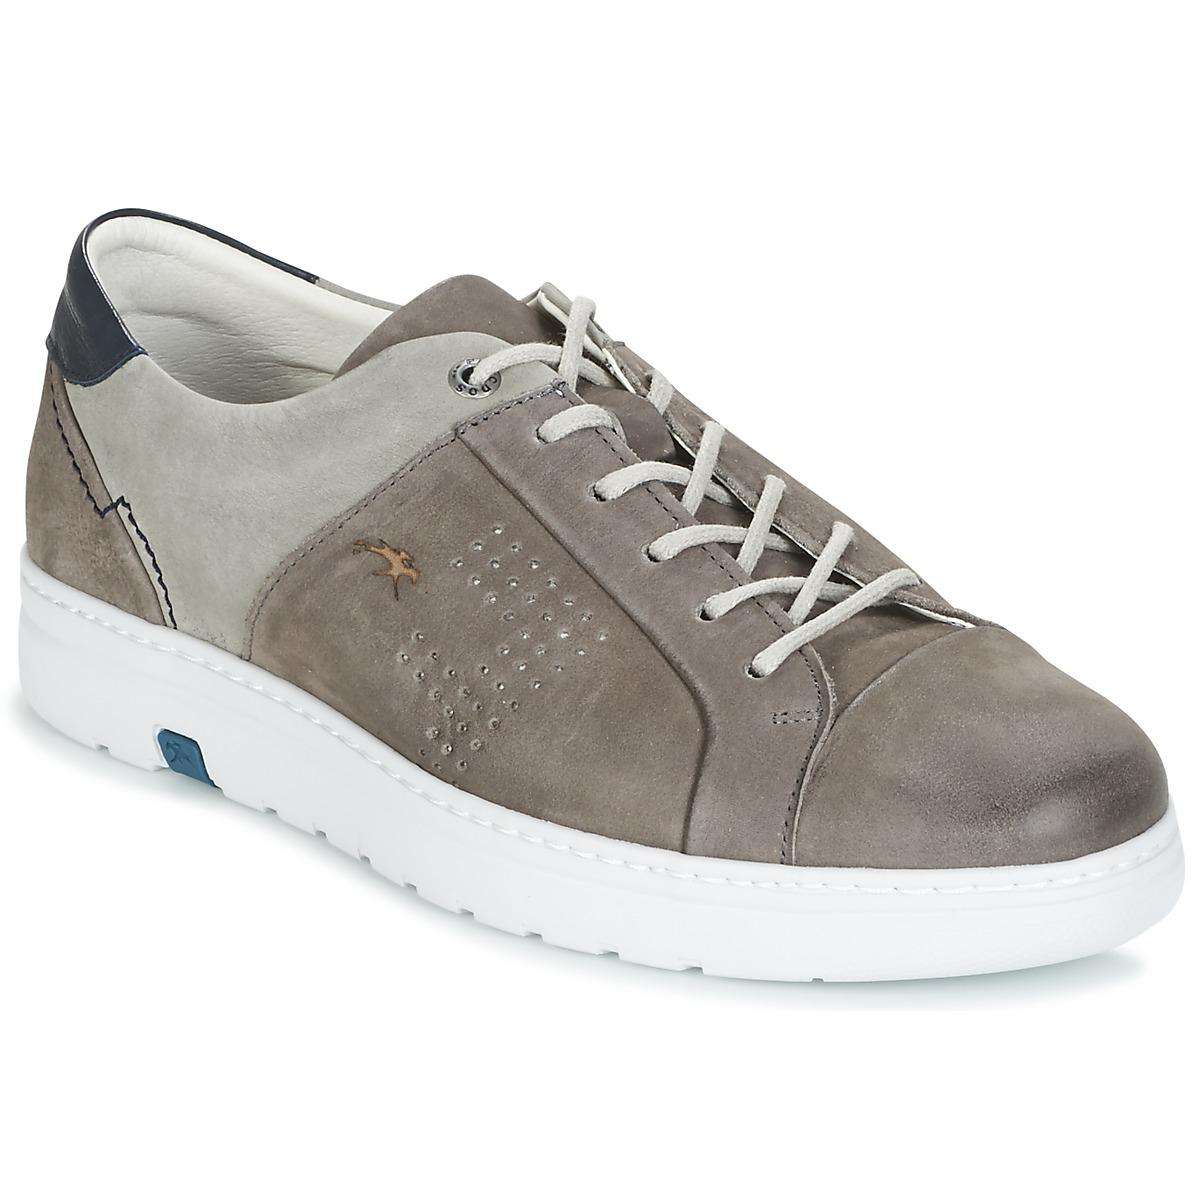 Ru5xrpf Chaussures Fluchos Basses Sneakers Amp; Tennis XXrzq